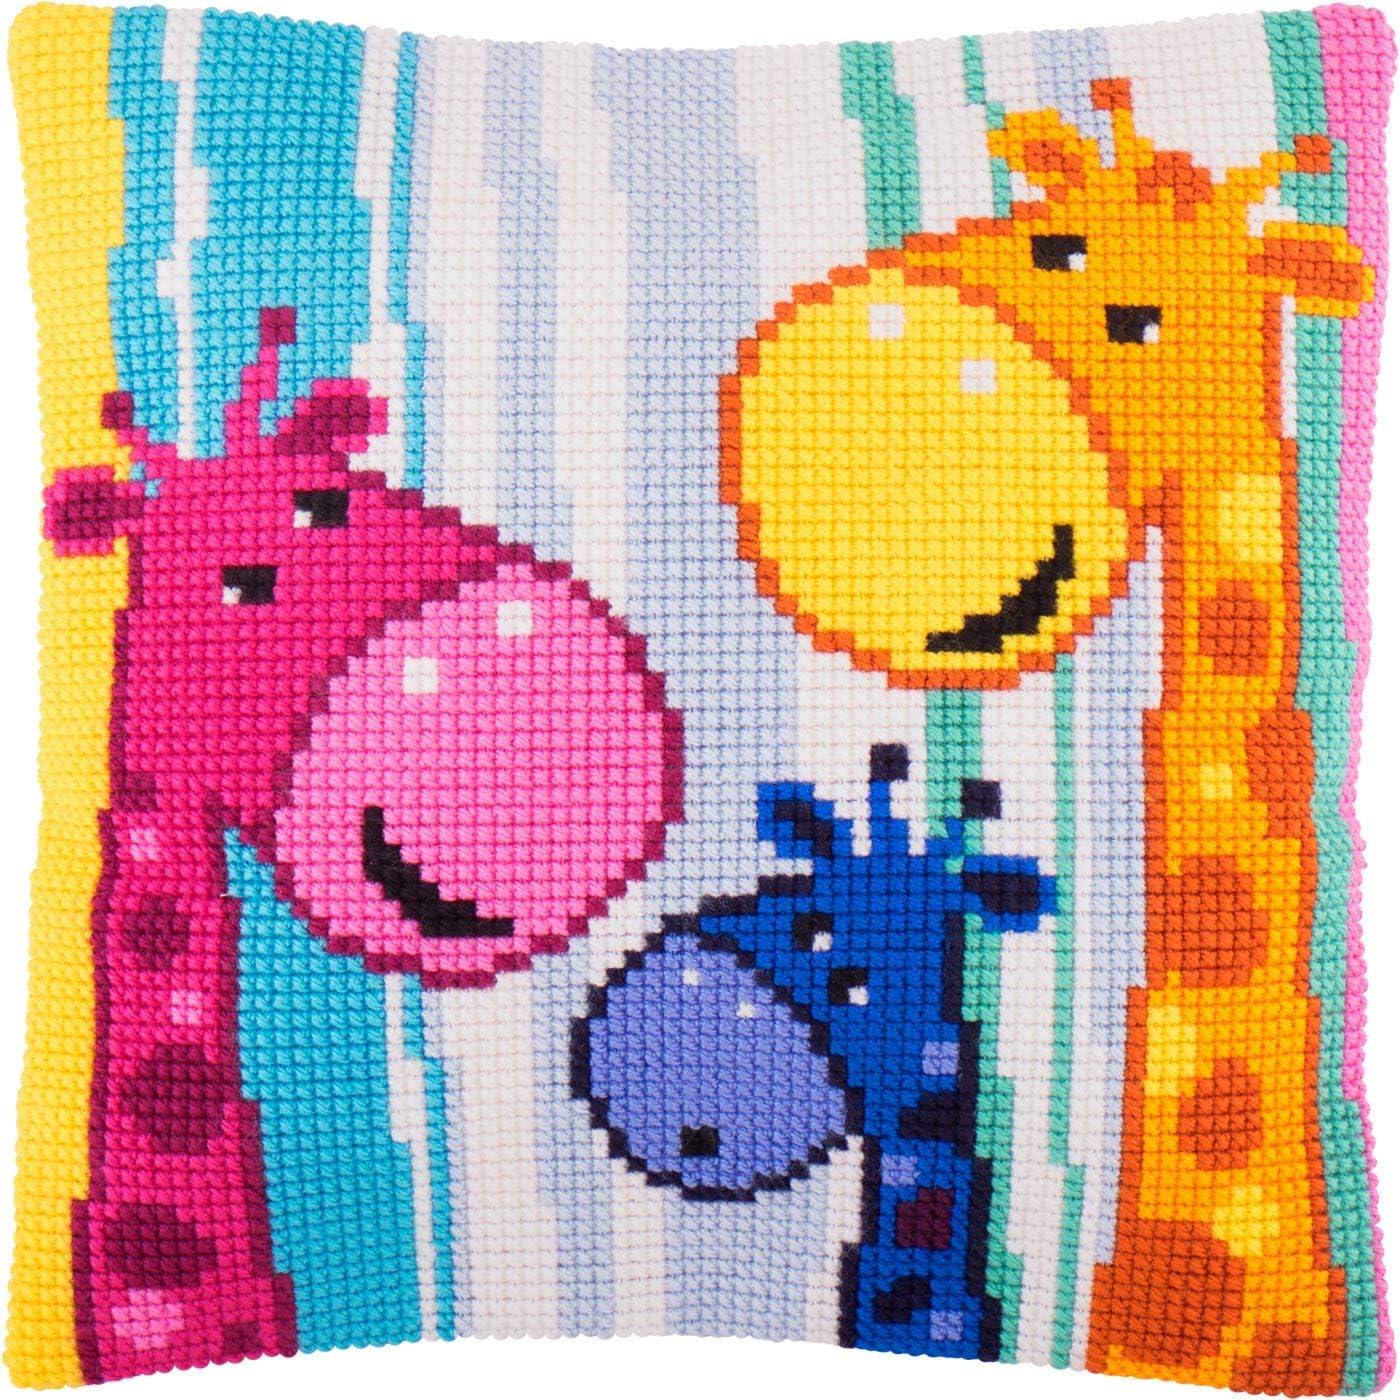 Giraffes Throw Pillow Case 16/×16 Inches Extra Stiff Canvas Cross Stitch Kit Premium European Quality